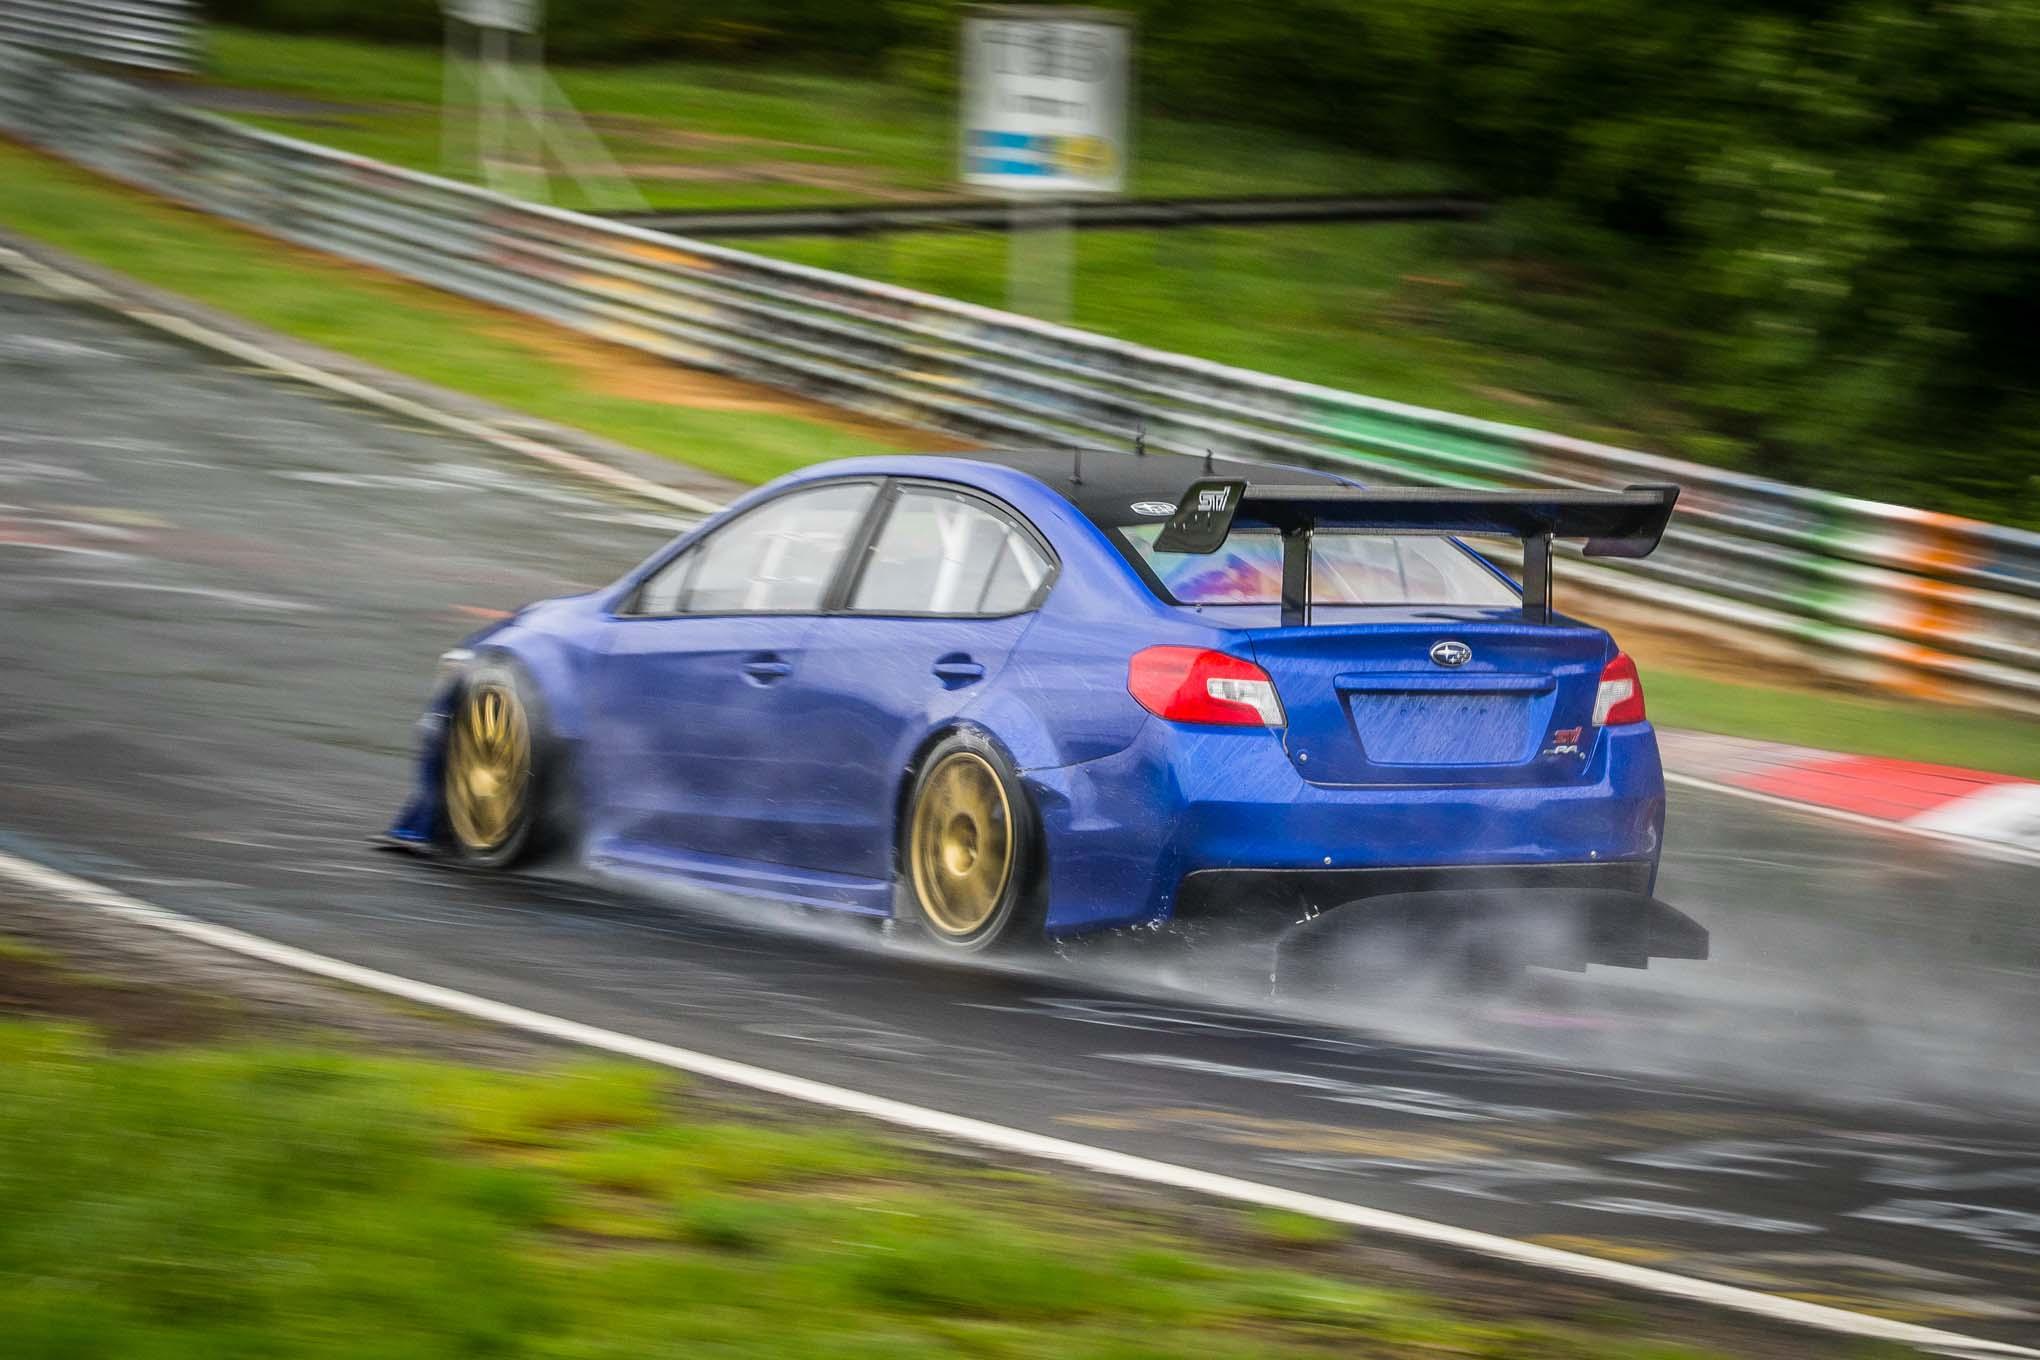 Nurburgring Monsoon Subaru Wrx Sti Record Attempt On The